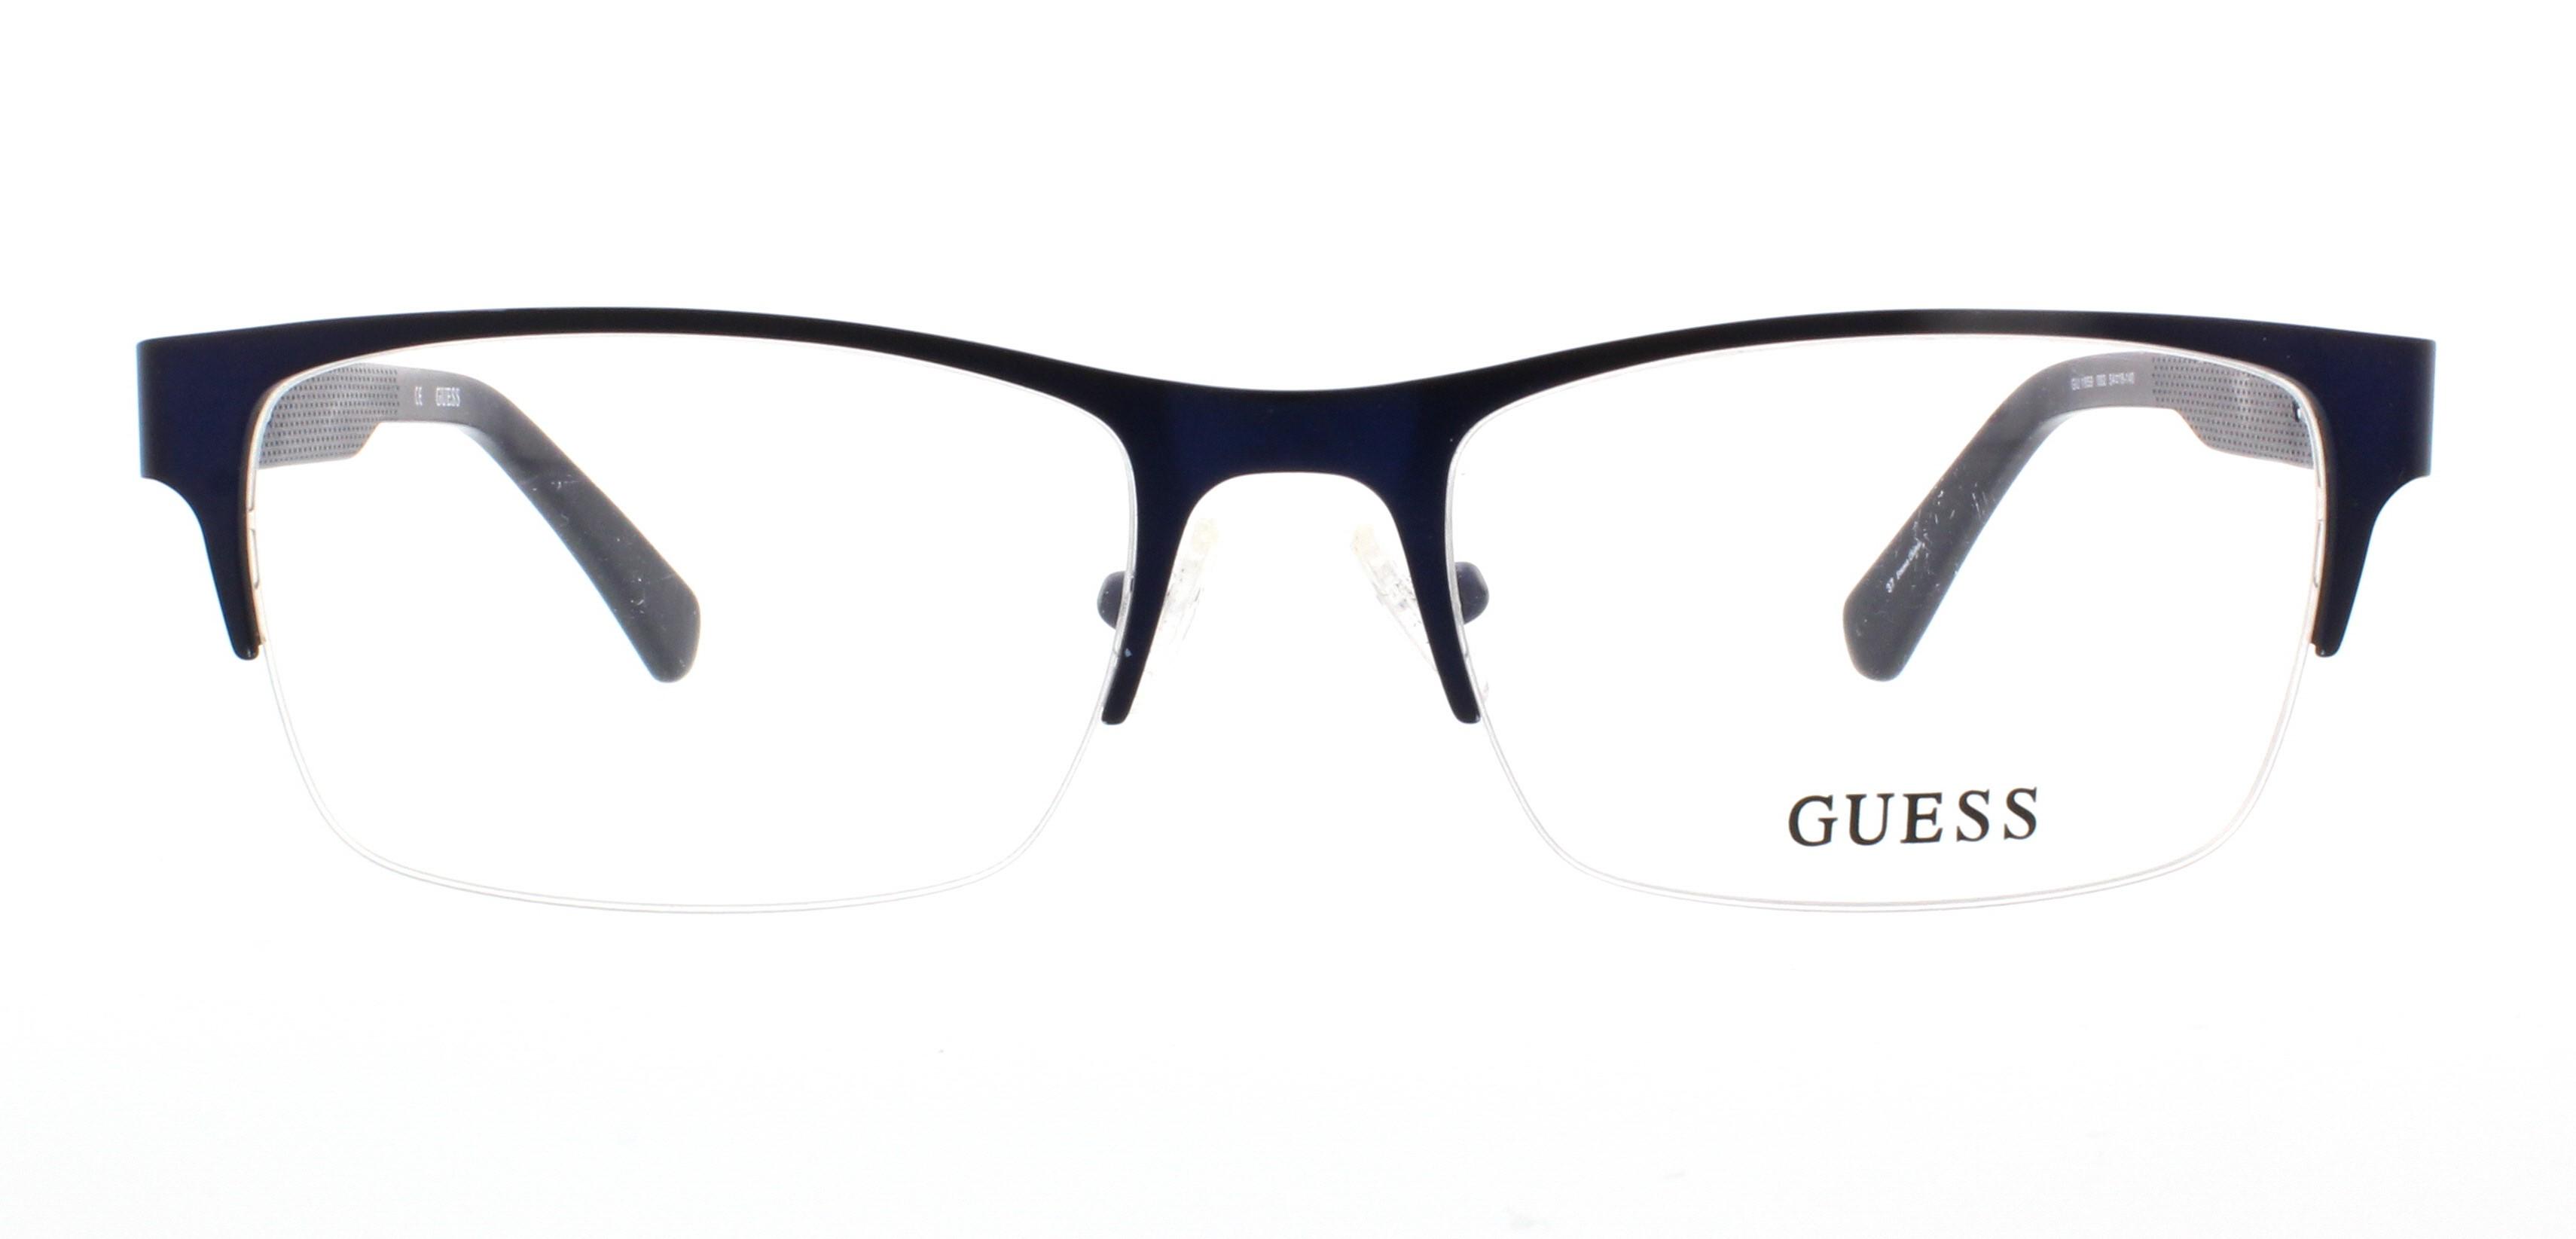 e93acb11242 Designer Frames Outlet. Guess GU1859